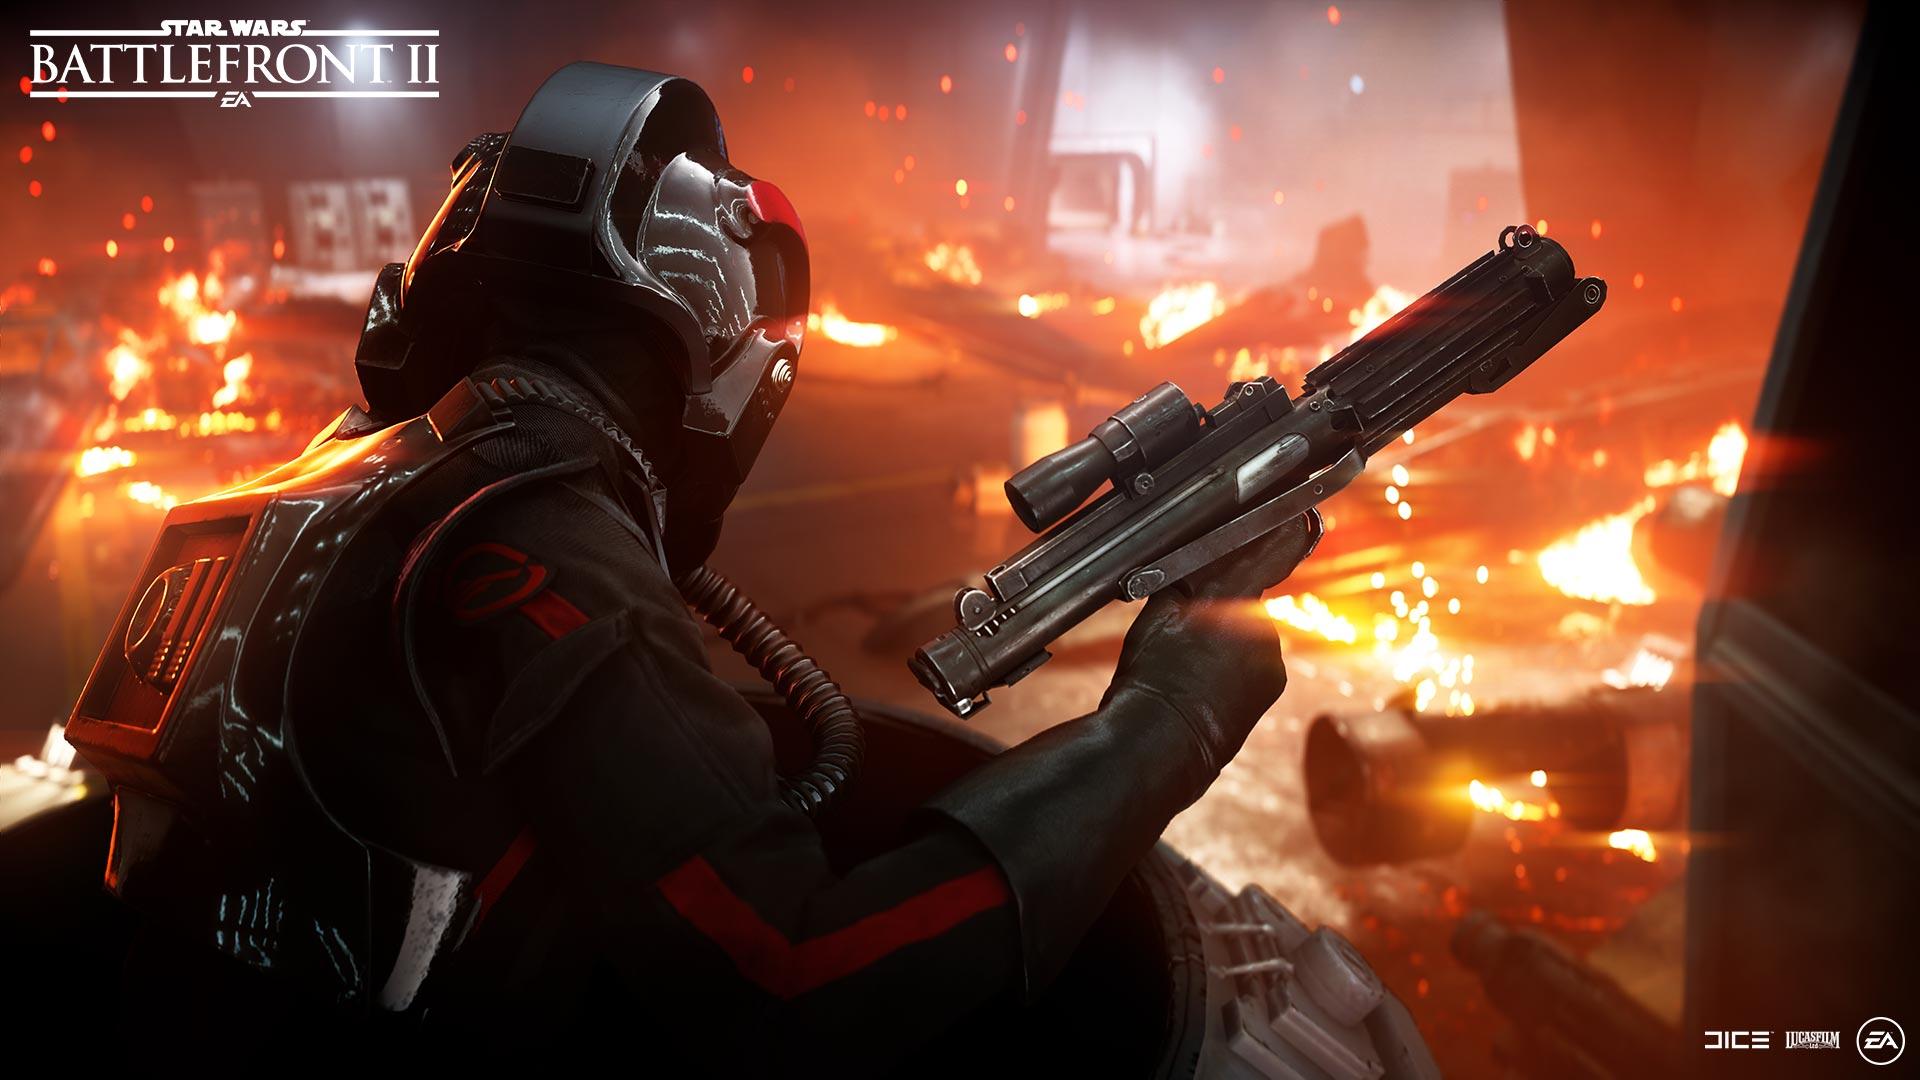 Star Wars Battlefront 2: Elite Corps incoming!